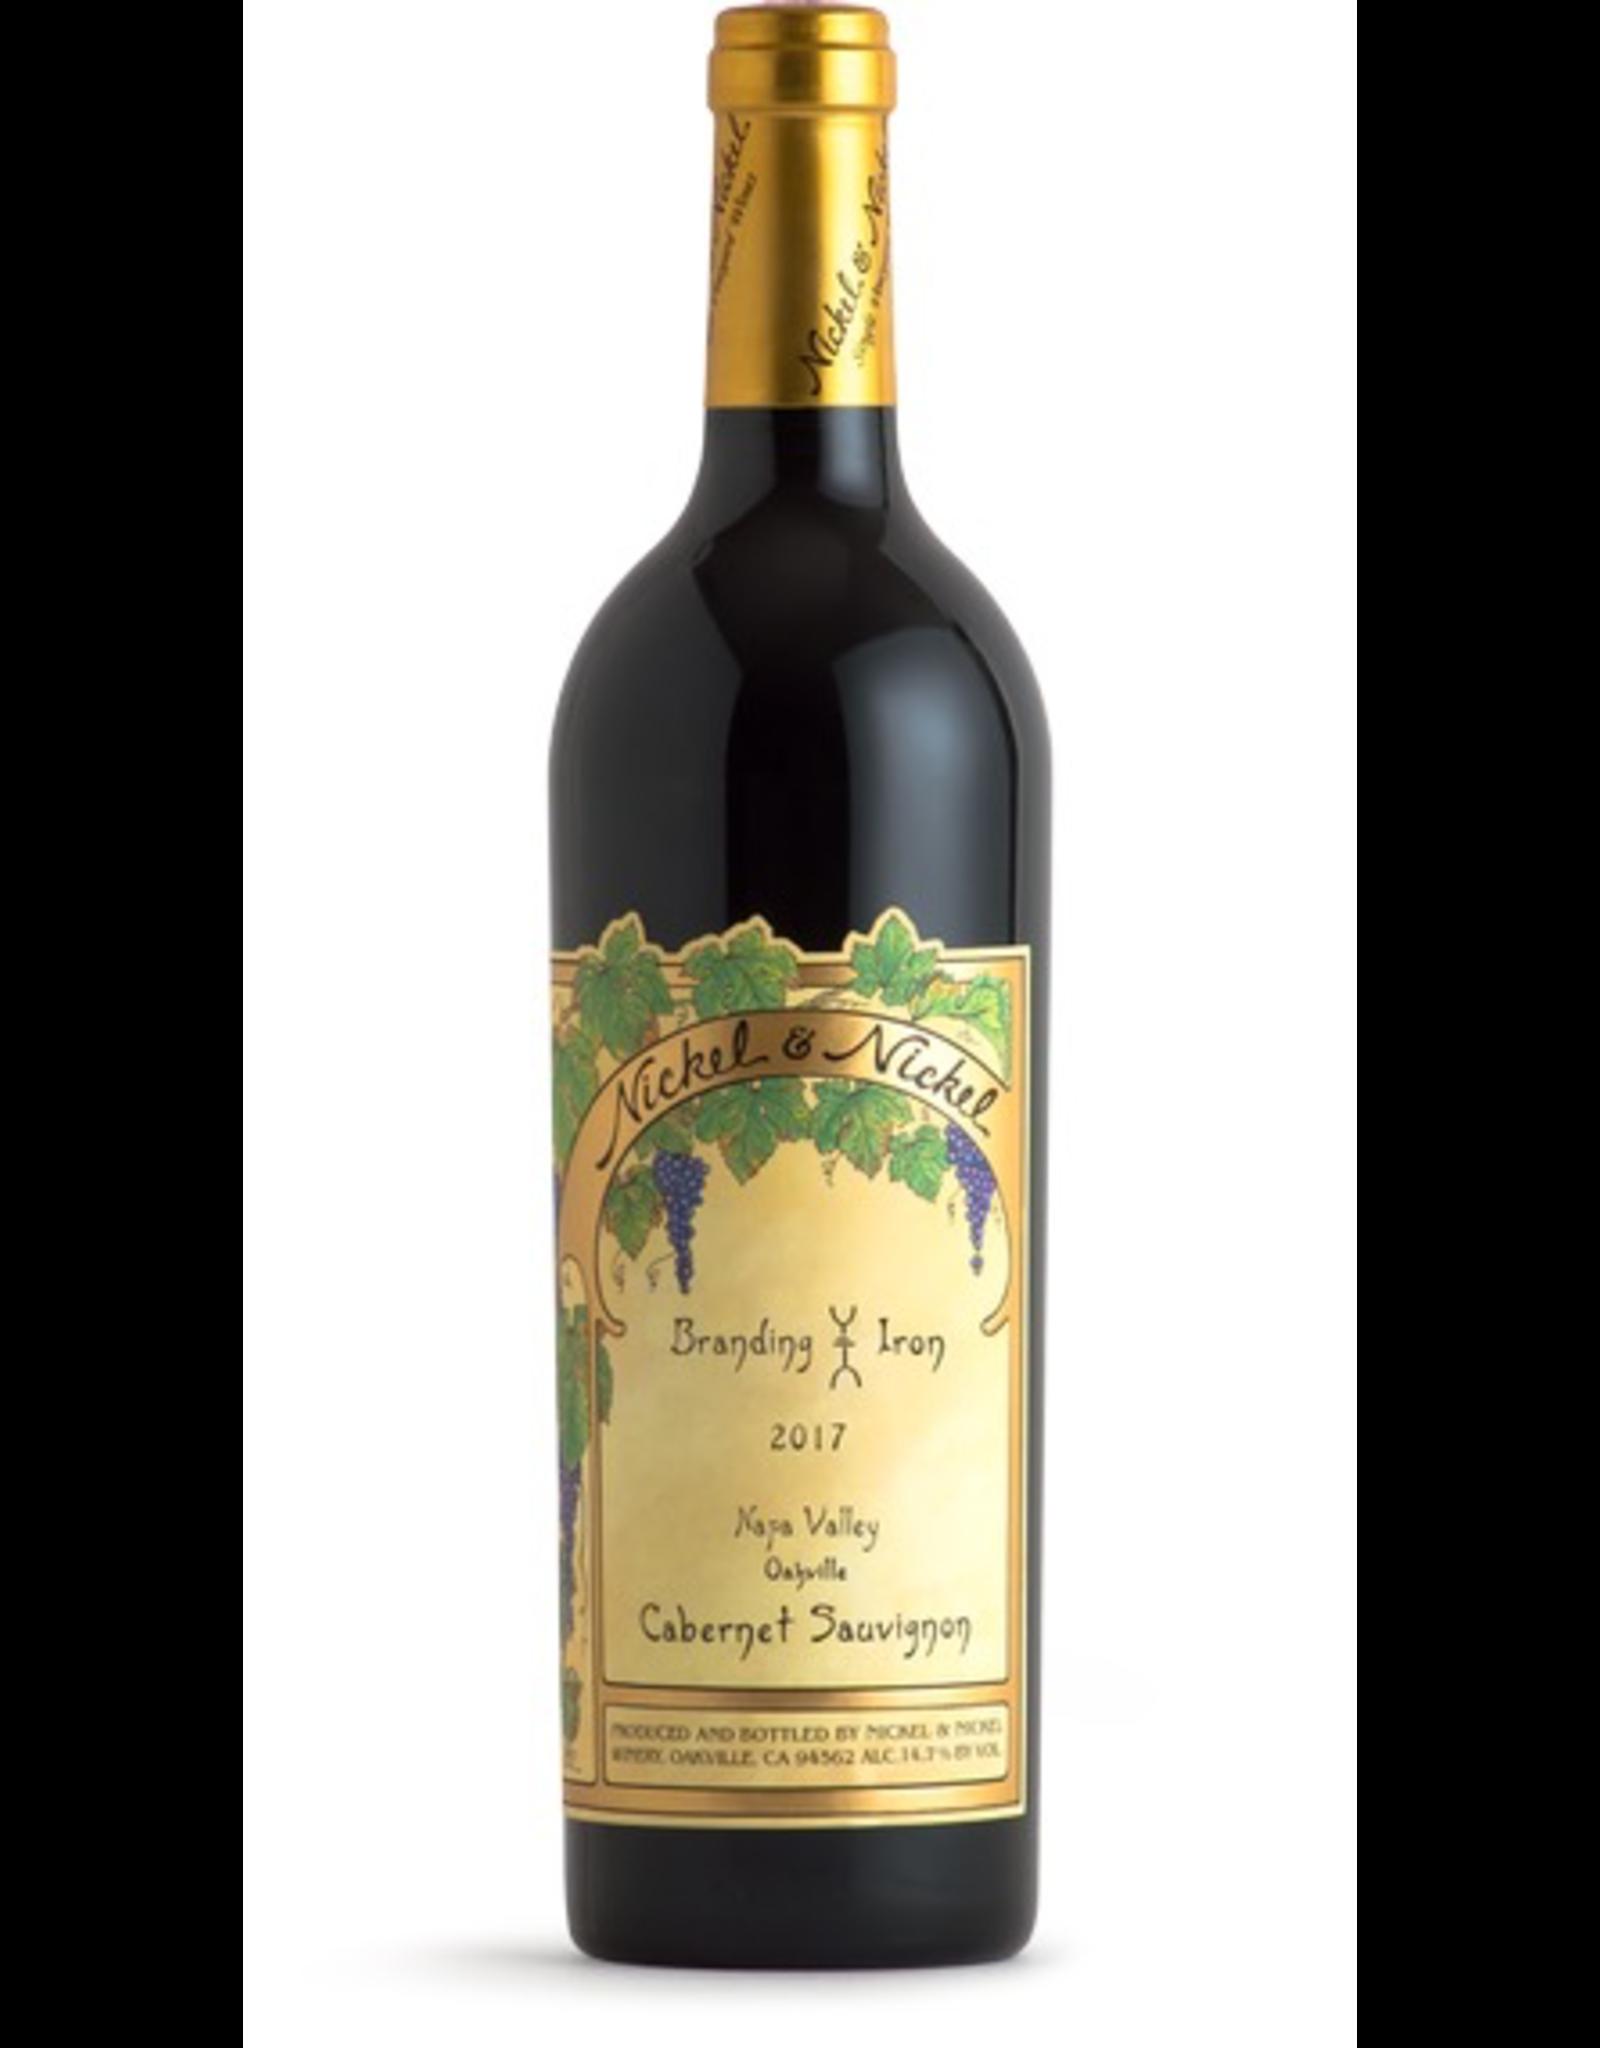 Red Wine 2017, Nickel & Nickel Branding Iron Vineyard, Cabernet Sauvignon, Oakville, Napa Valley, California, 14.5% Alc, CT87